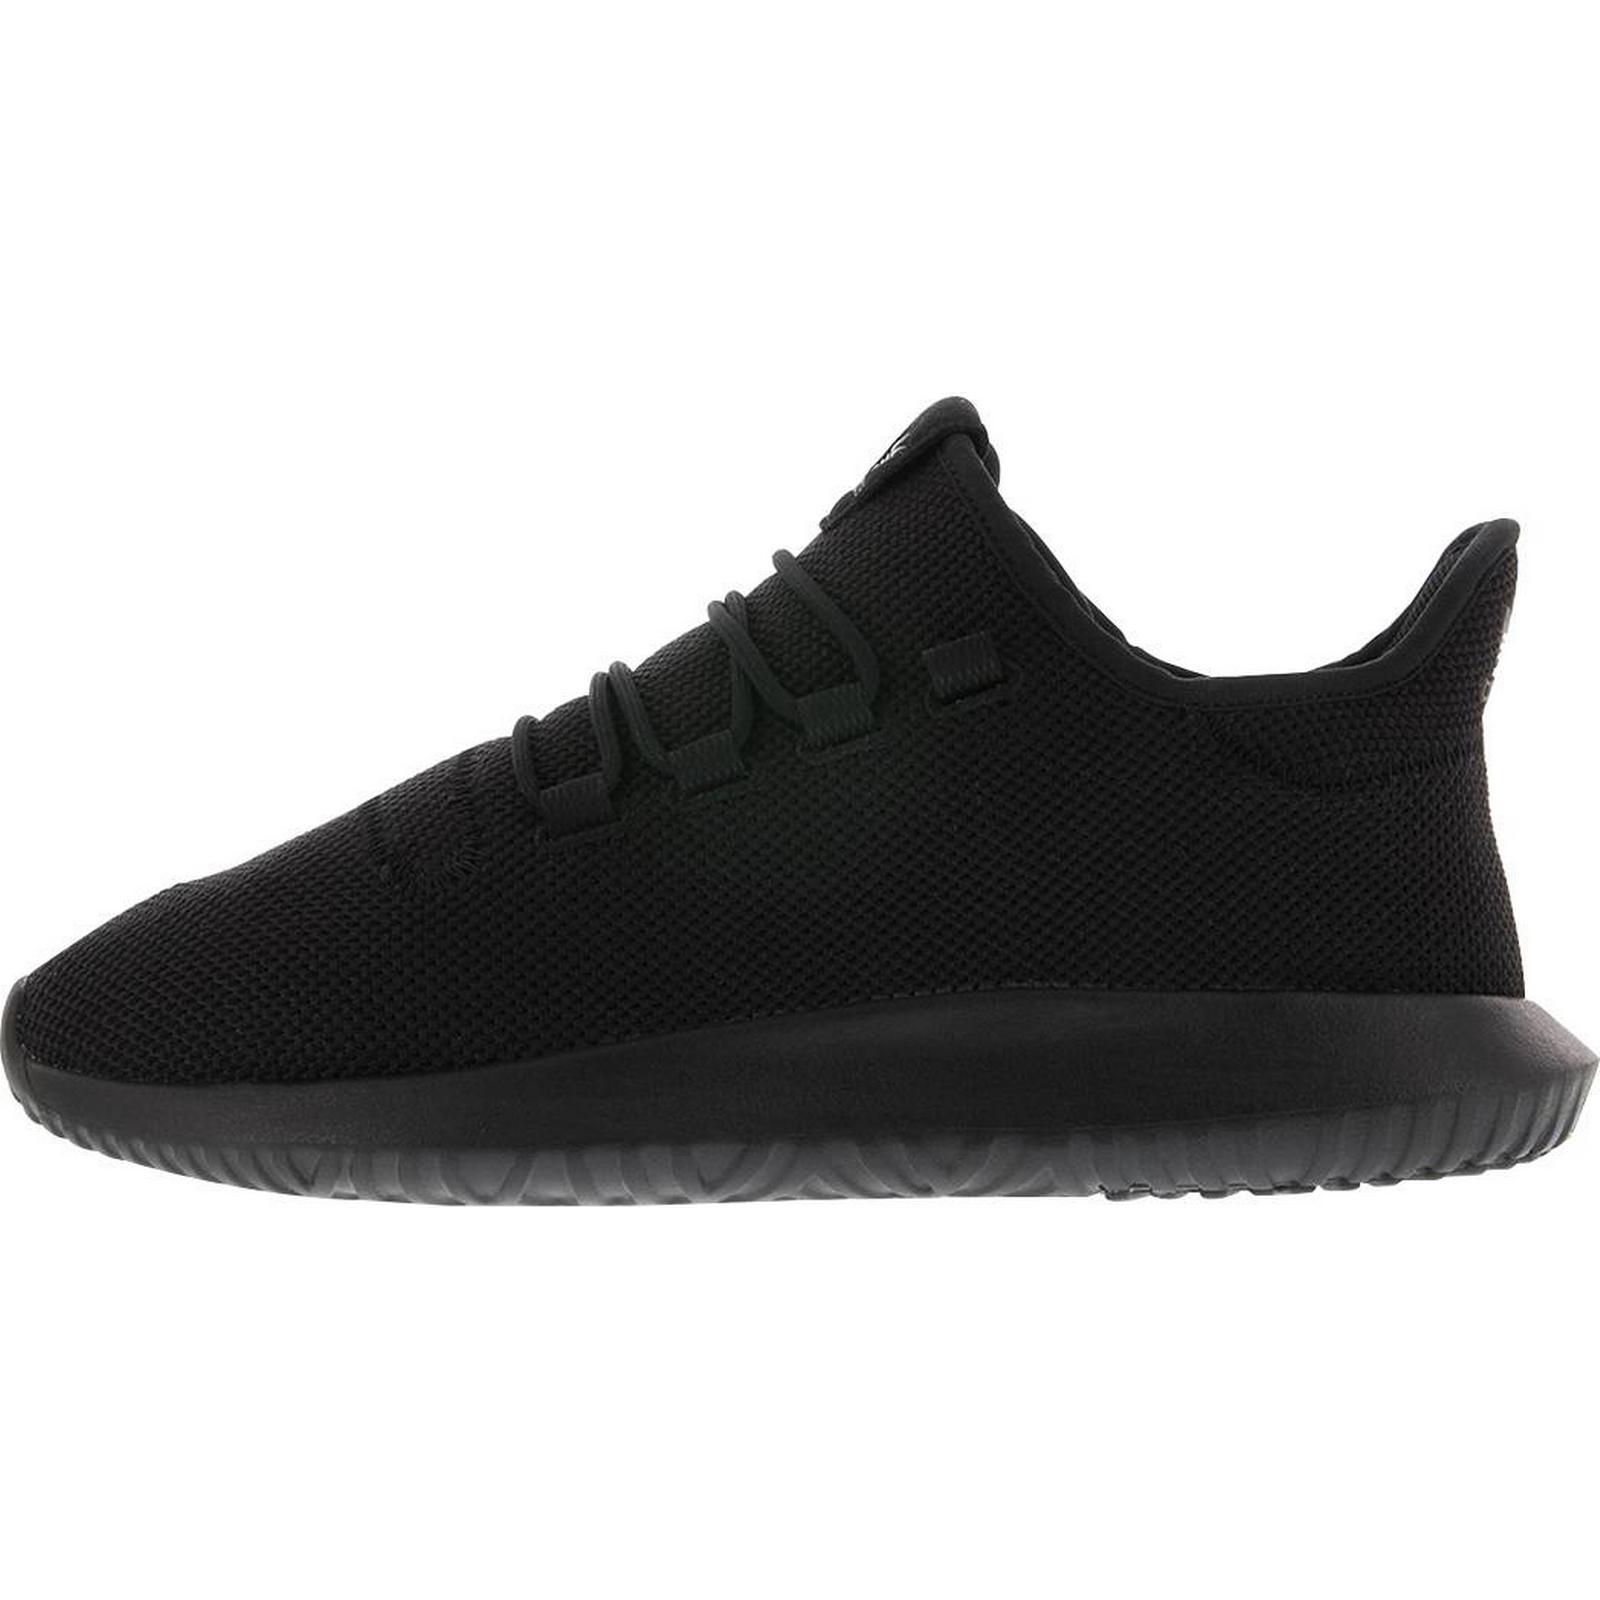 Adidas Adidas Adidas Tubular Shadow - Zwart 2f820b